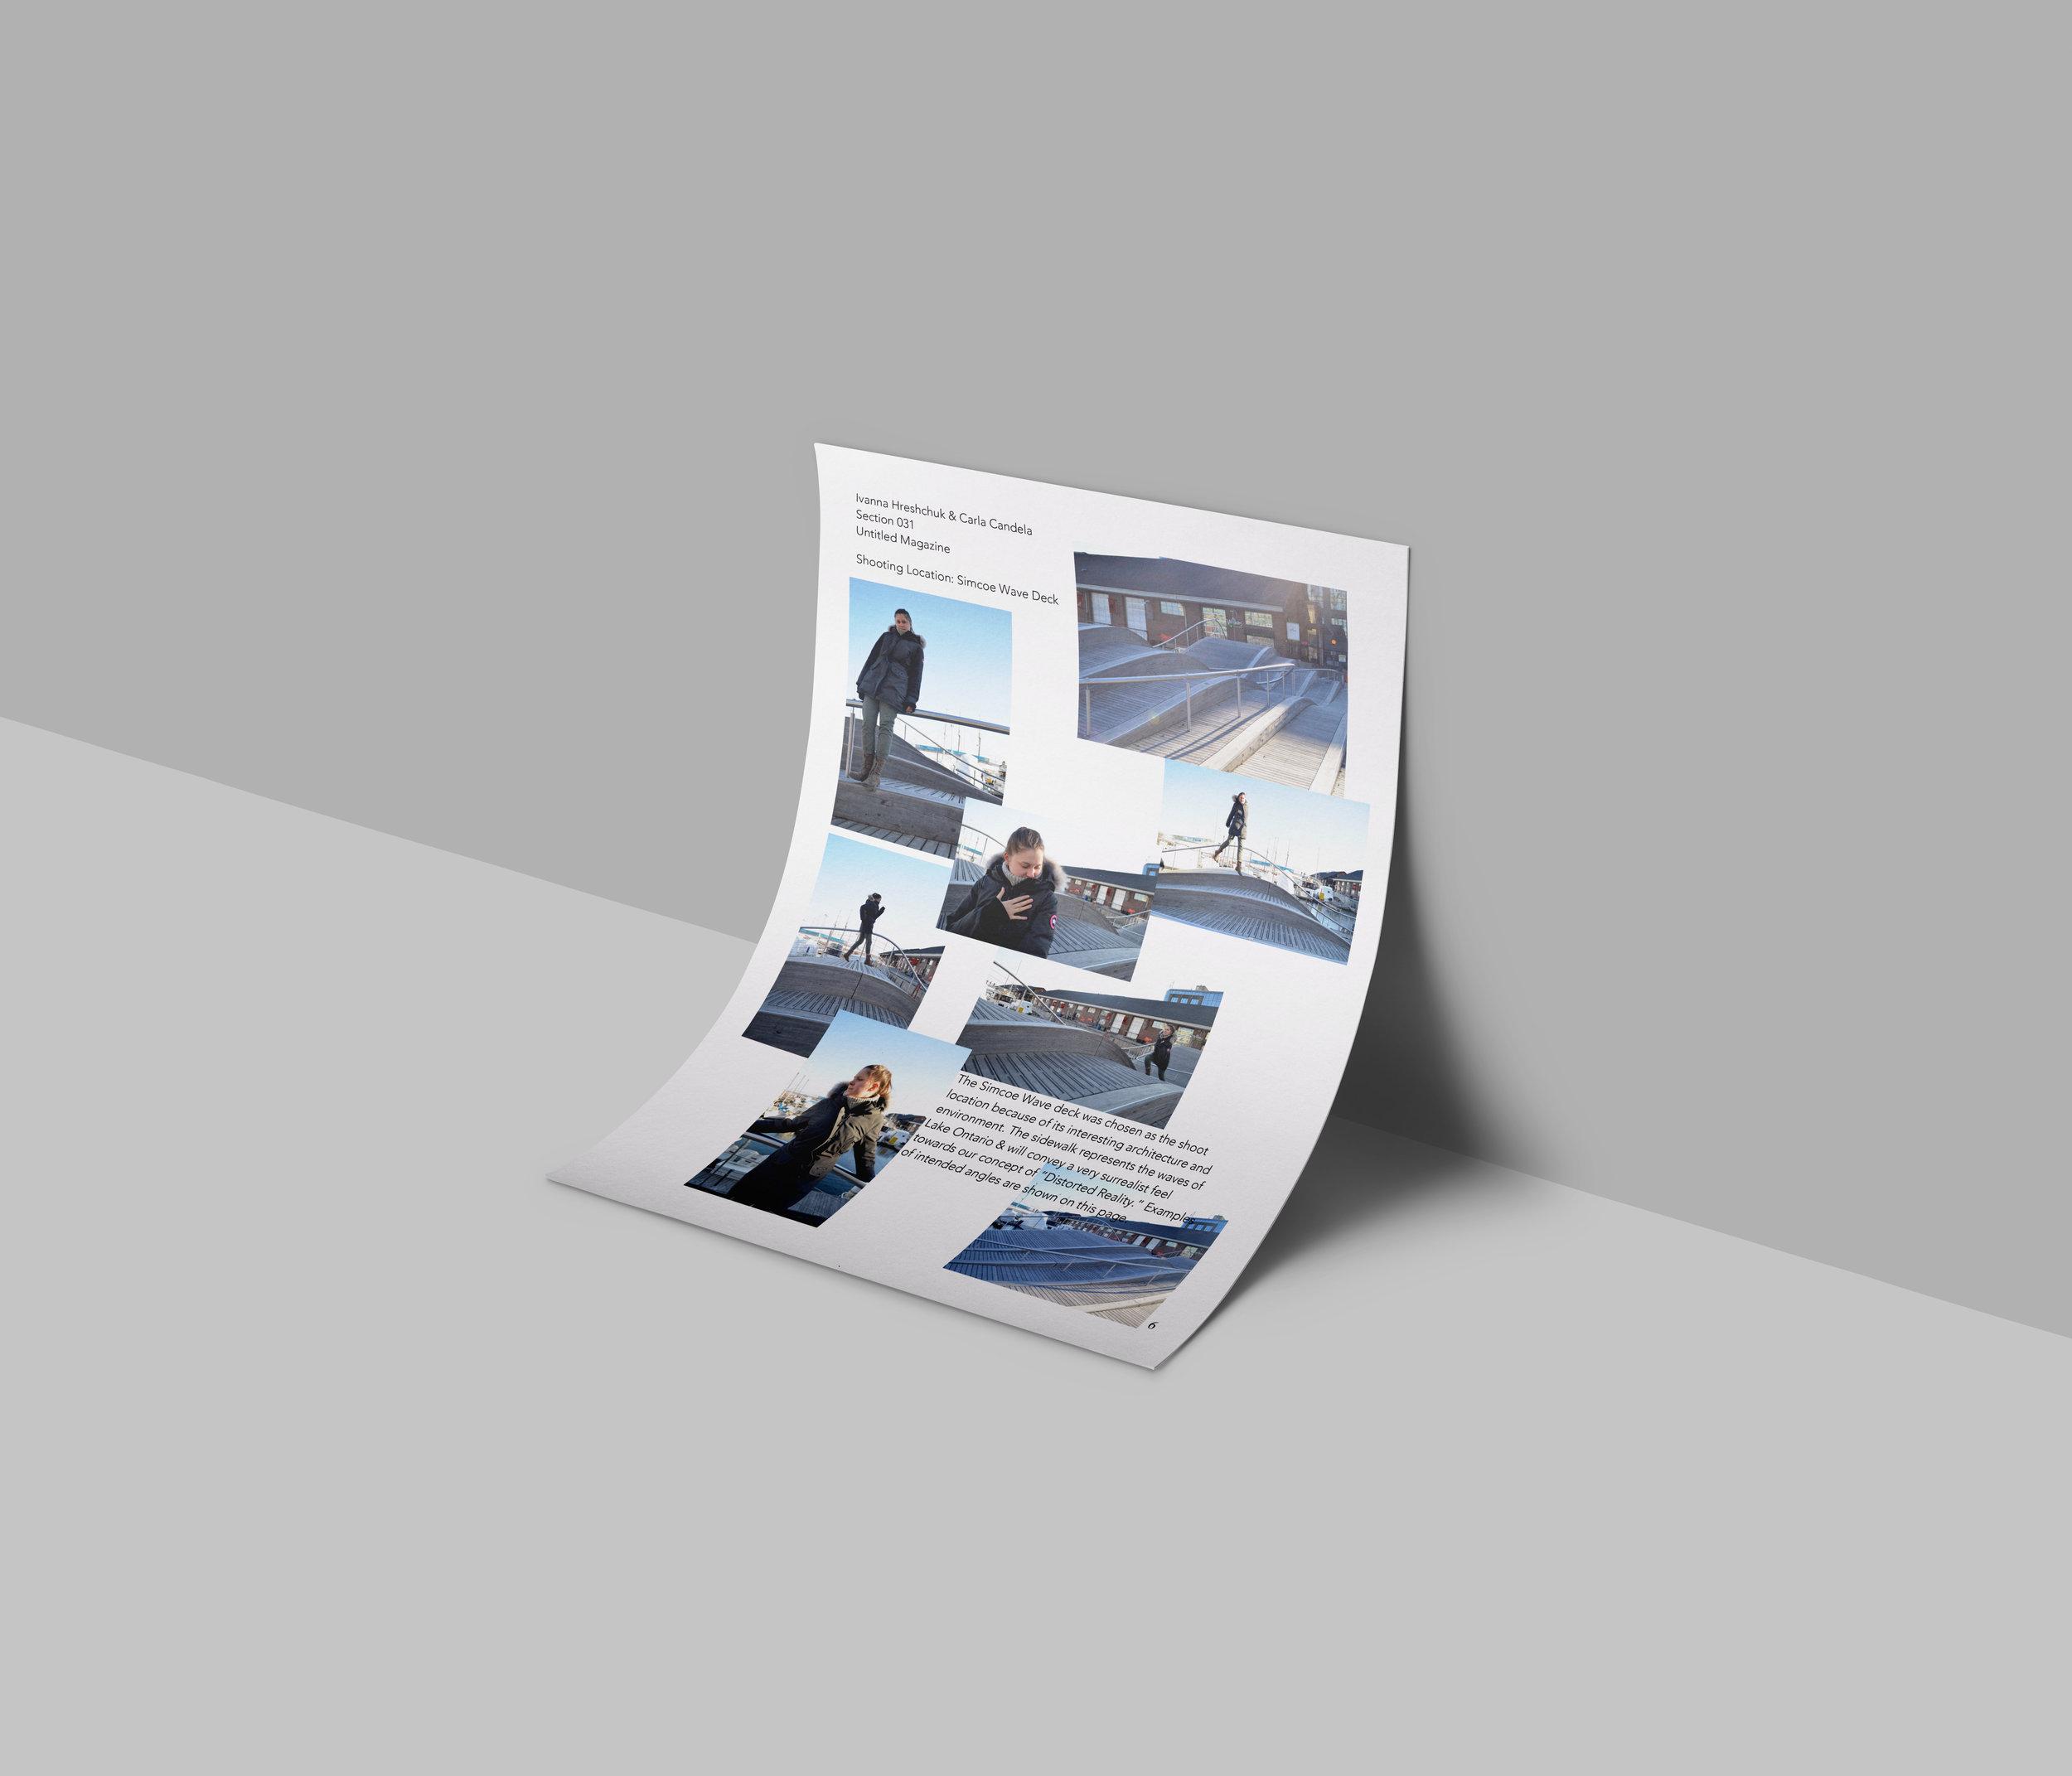 Distorted-Reality-Ivanna-Process-3.jpg